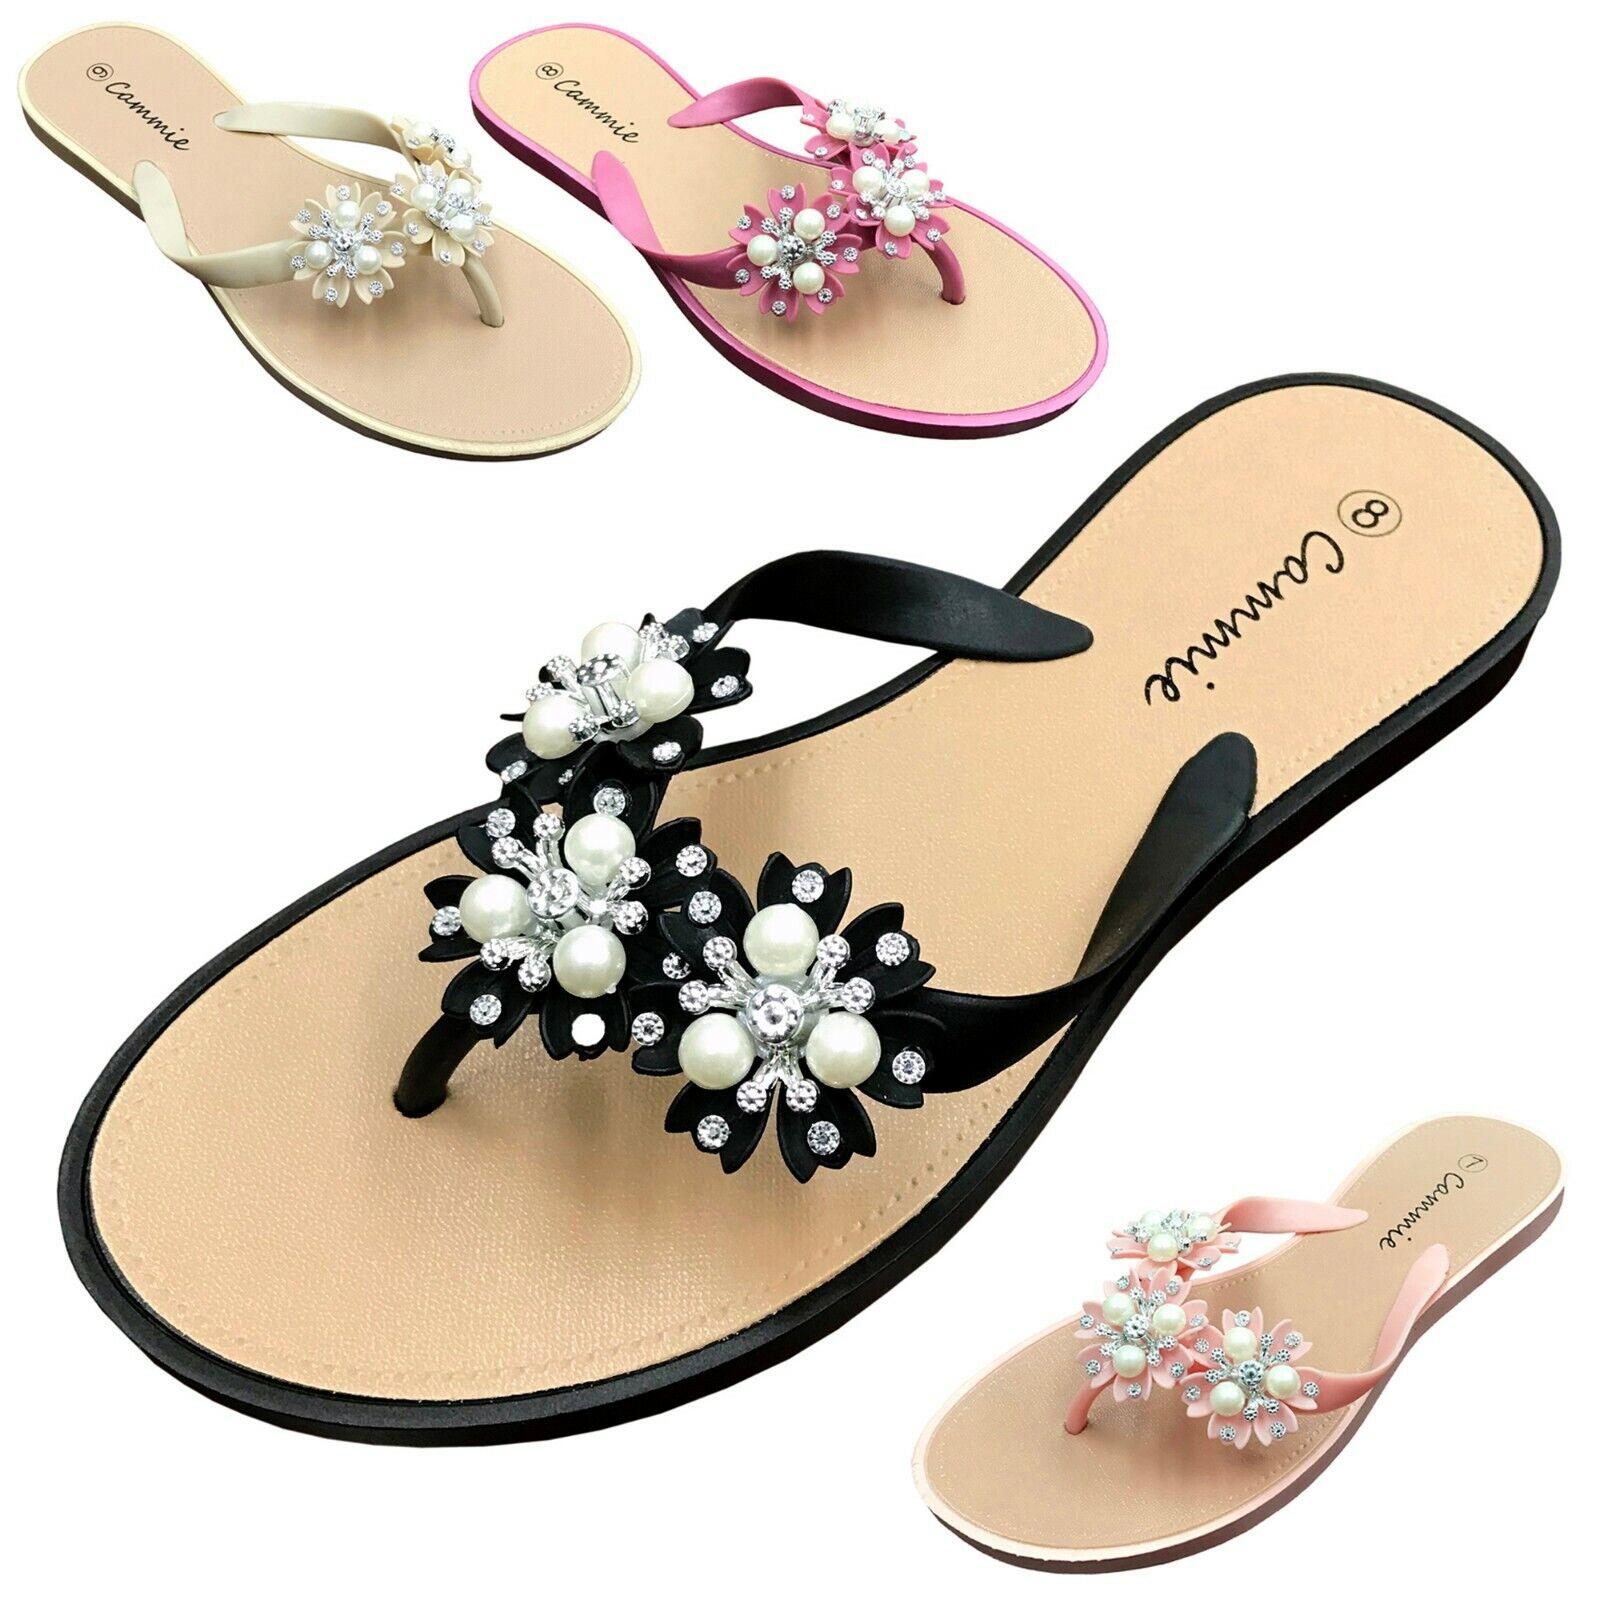 NEW Women's Flower Pearl Rhinestone Sandals Flat Jelly Thong